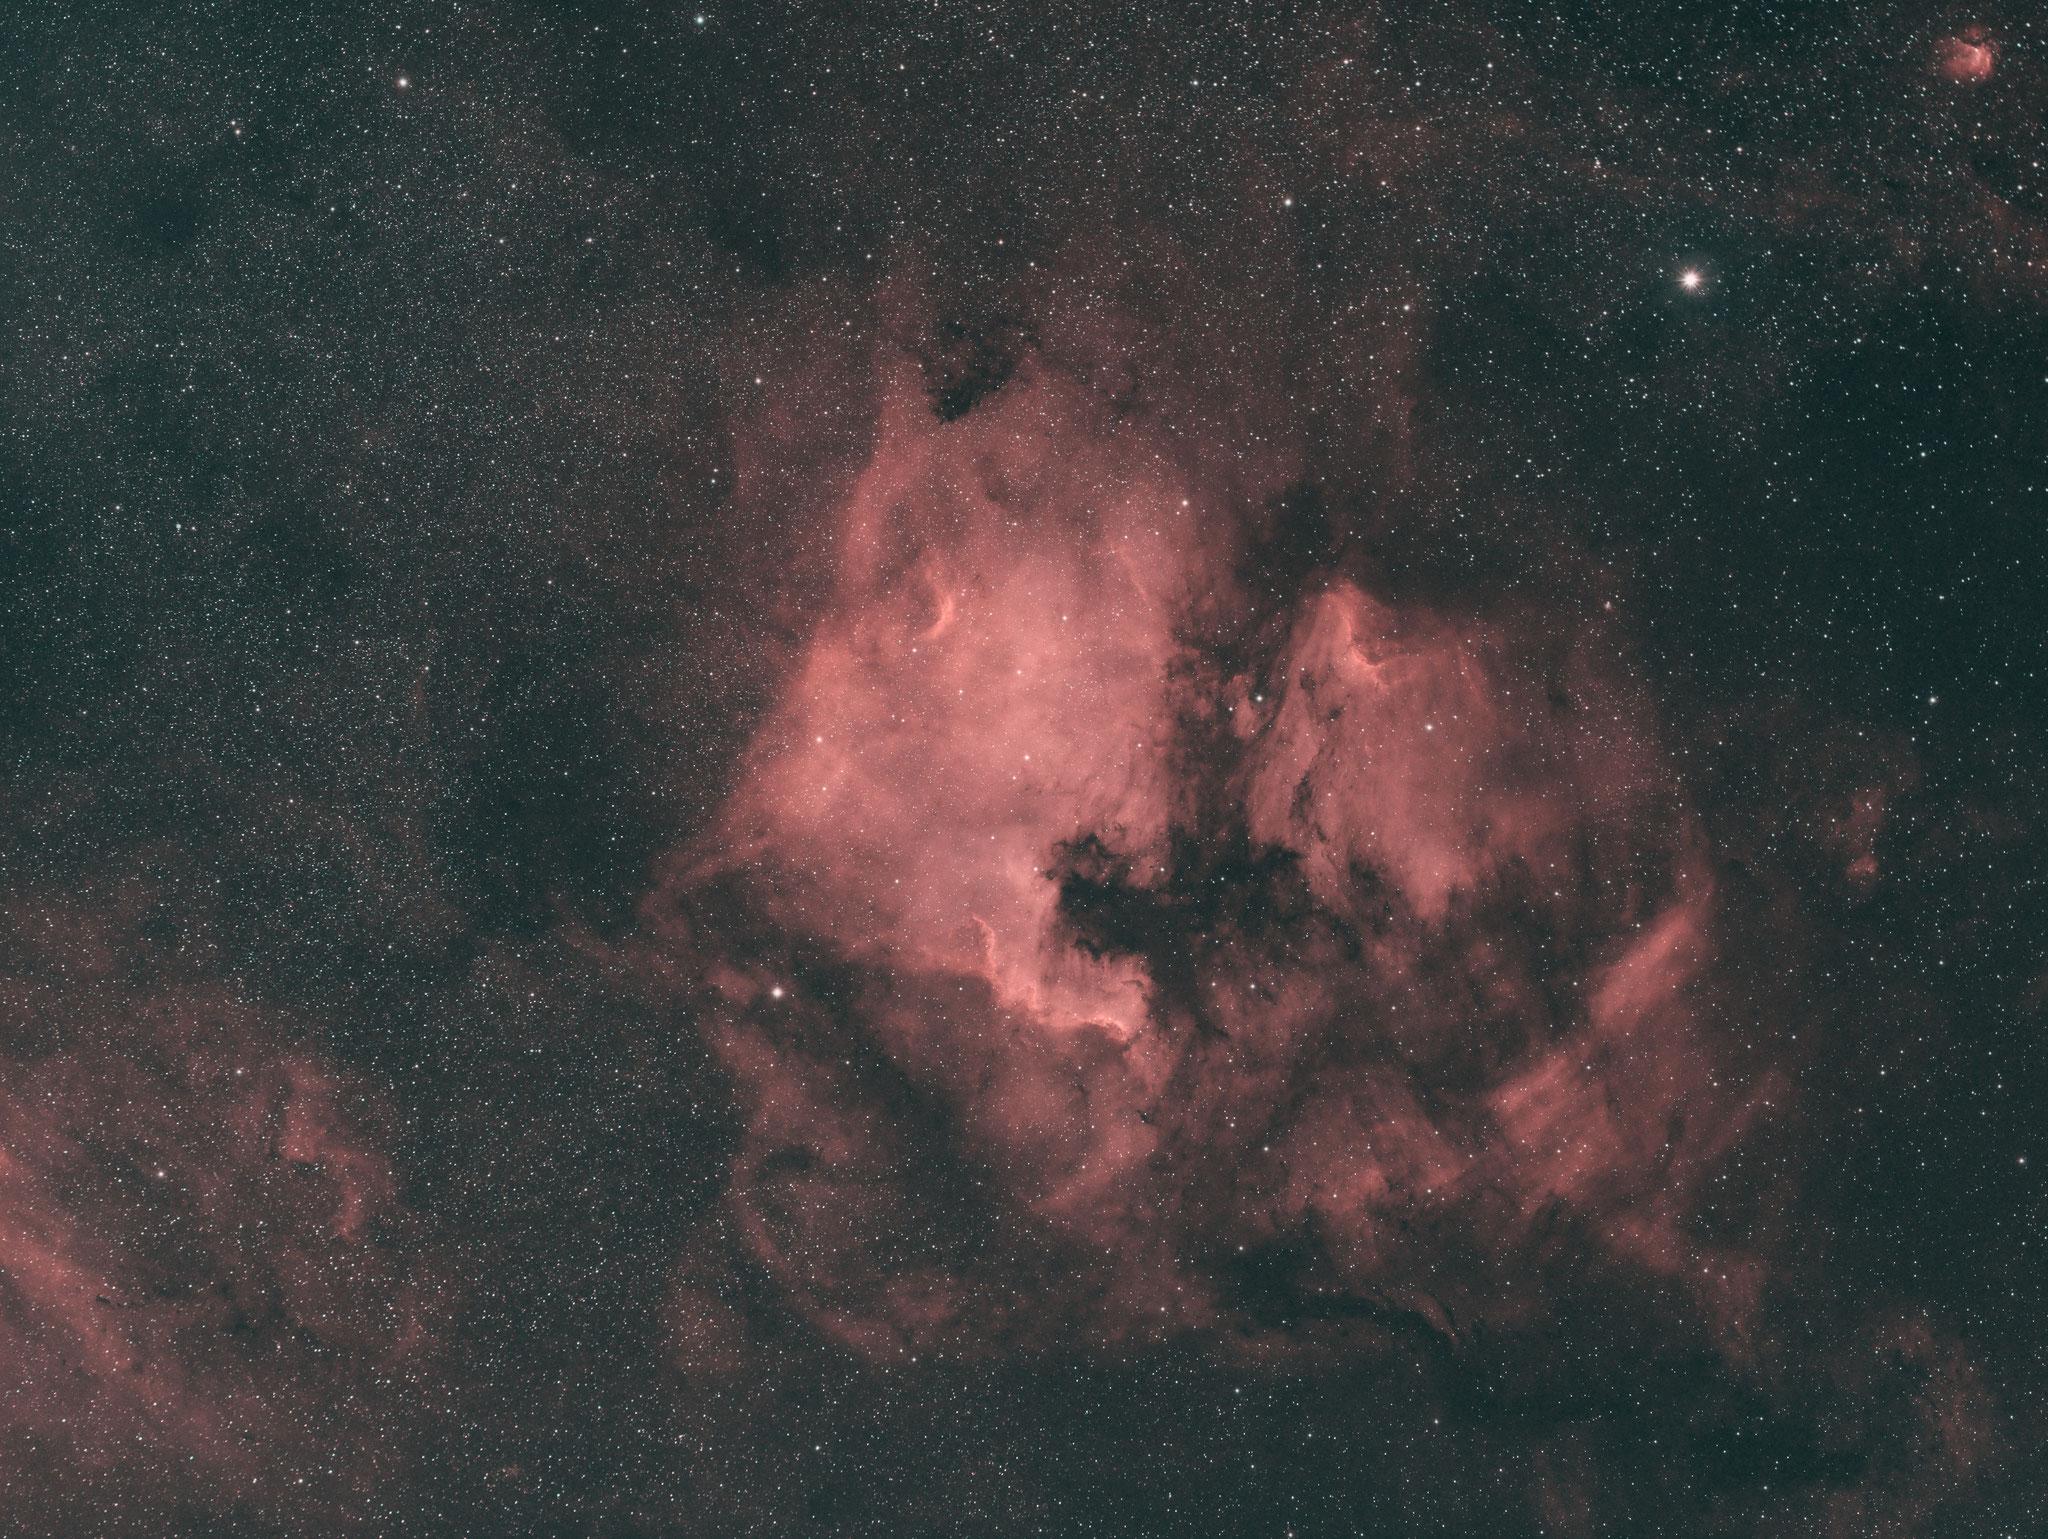 NGC 7000; Samyang 135mm; Ha (7nm) 25x180s, OIII (8,5nm) 16x180s, Pseudo LRGB mit Ha als Luminaz, R:Ha, G:OIII, B:OIII